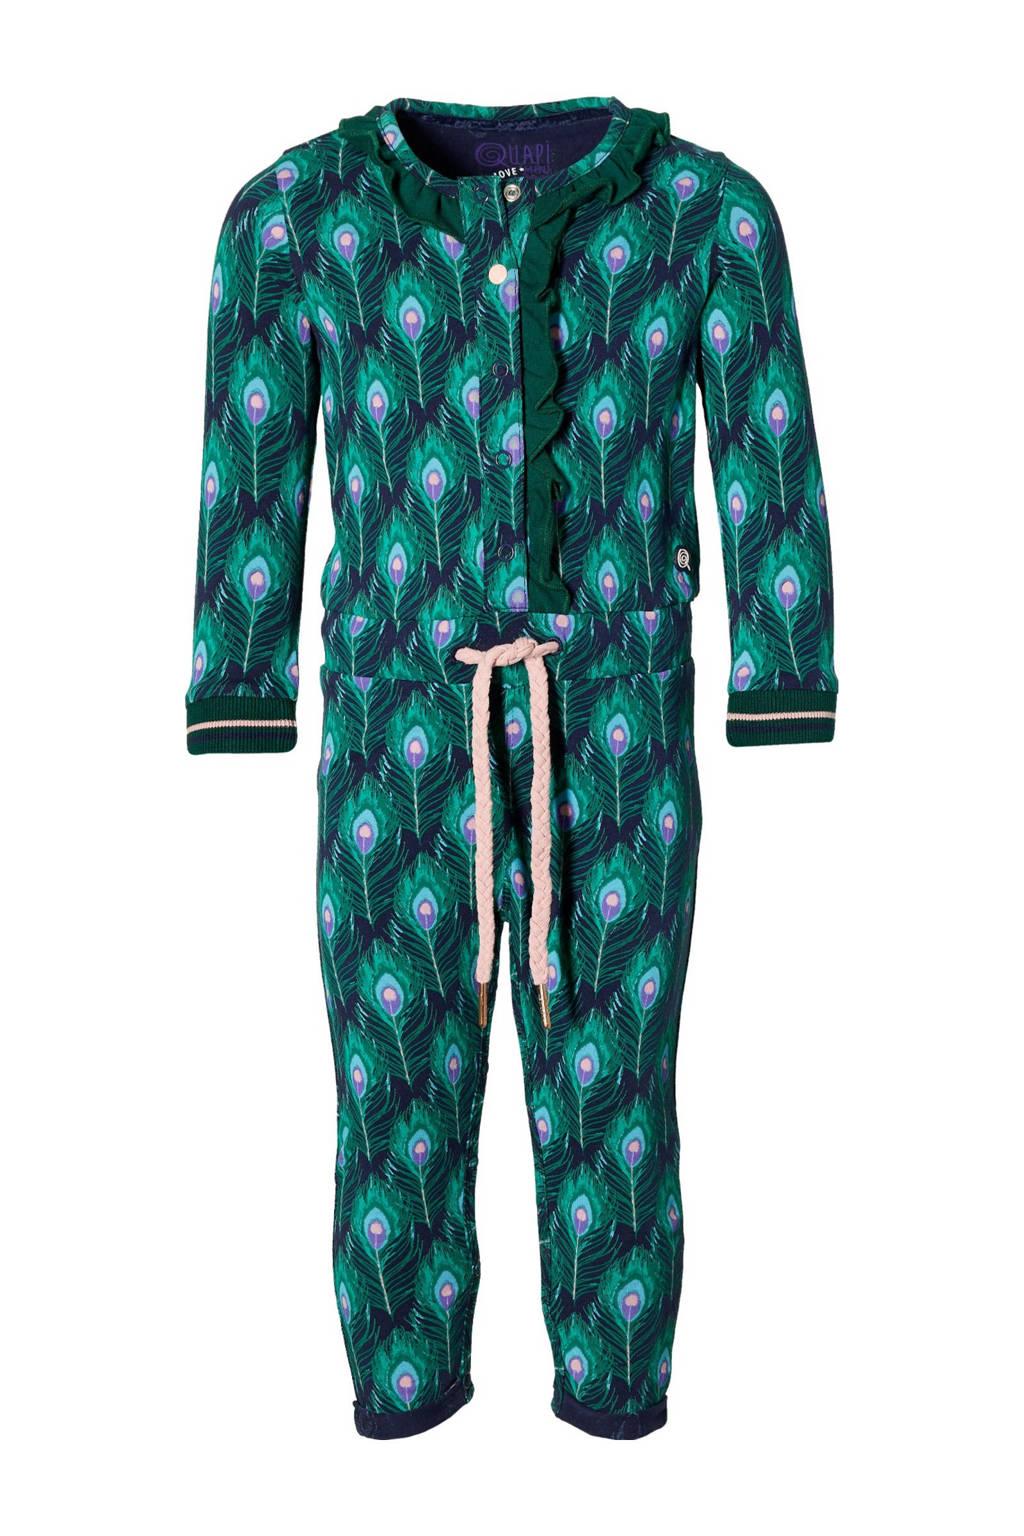 Quapi Mini jumpsuit Emma met dierenprint groen/blauw, Groen/blauw